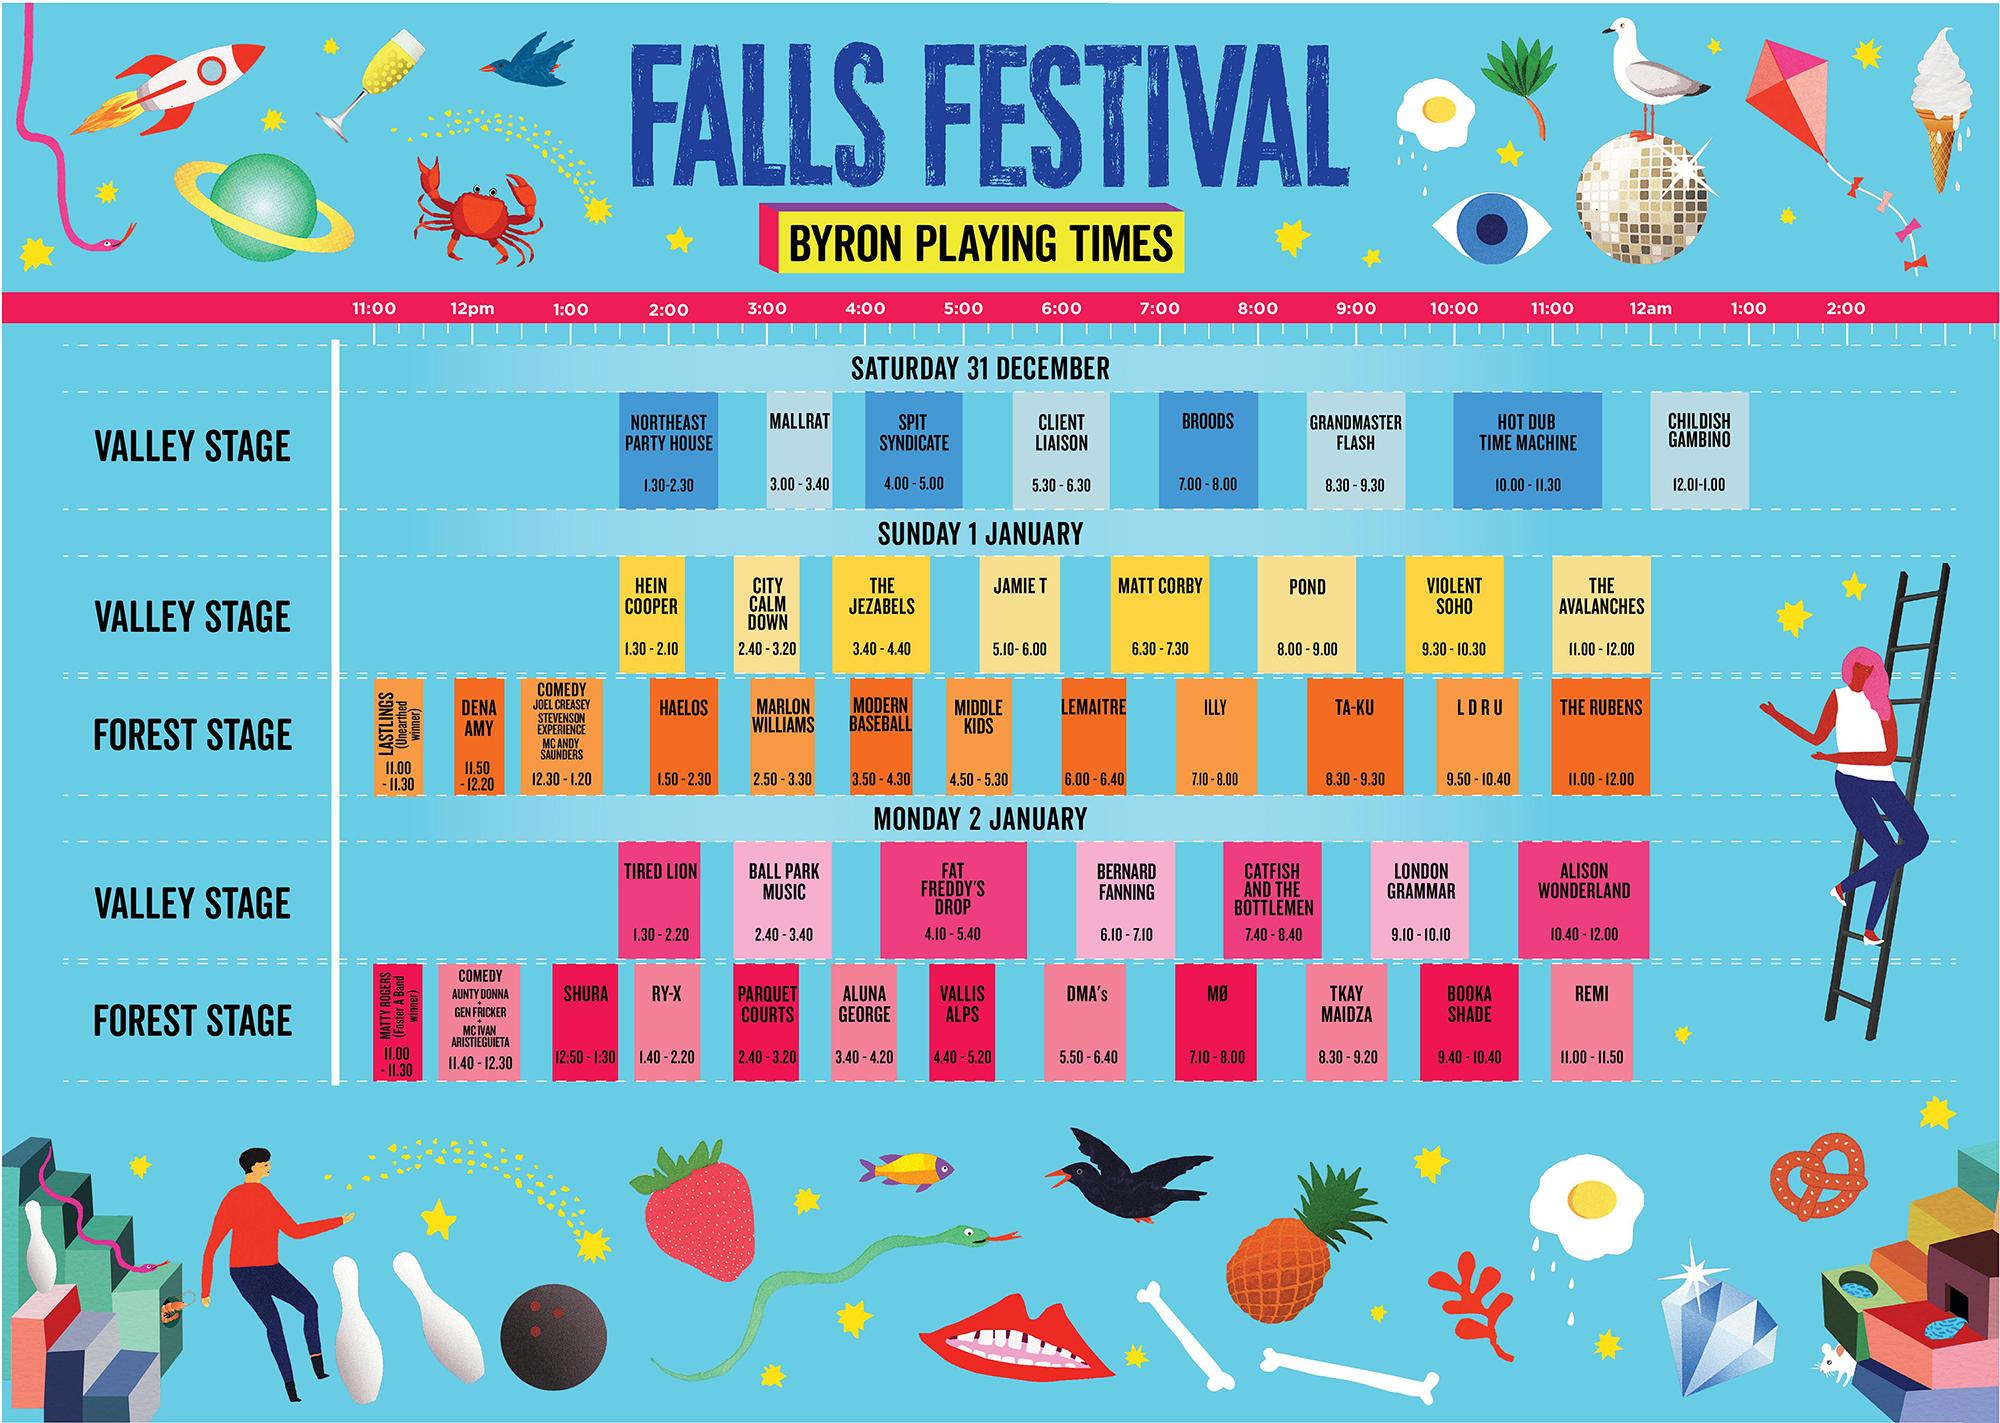 Falls_2016_PlayingTimes_Byron